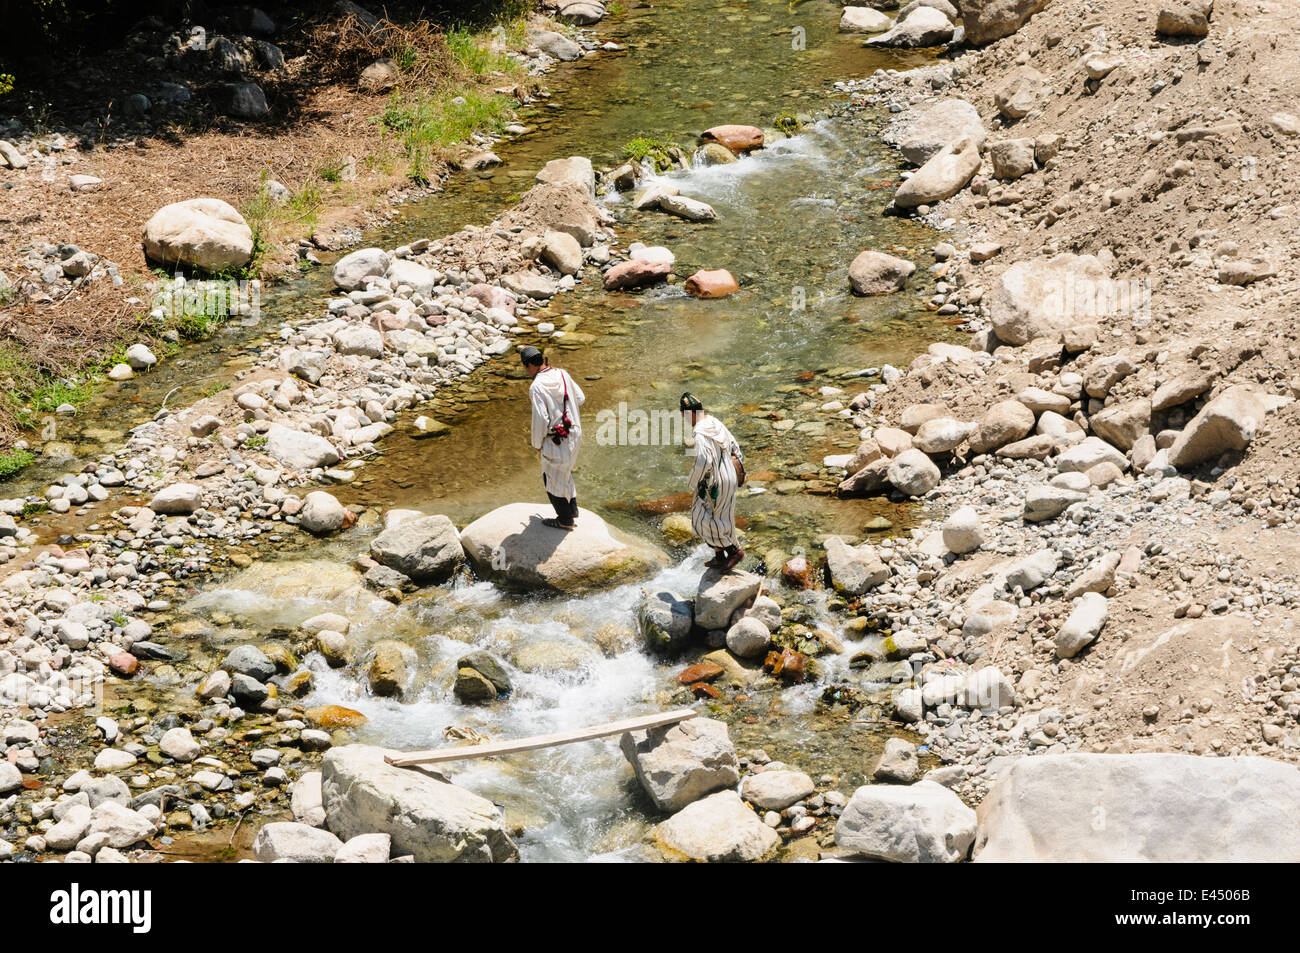 Ourika River, Ourika Valley, Atlas Mountains, Morocco - Stock Image